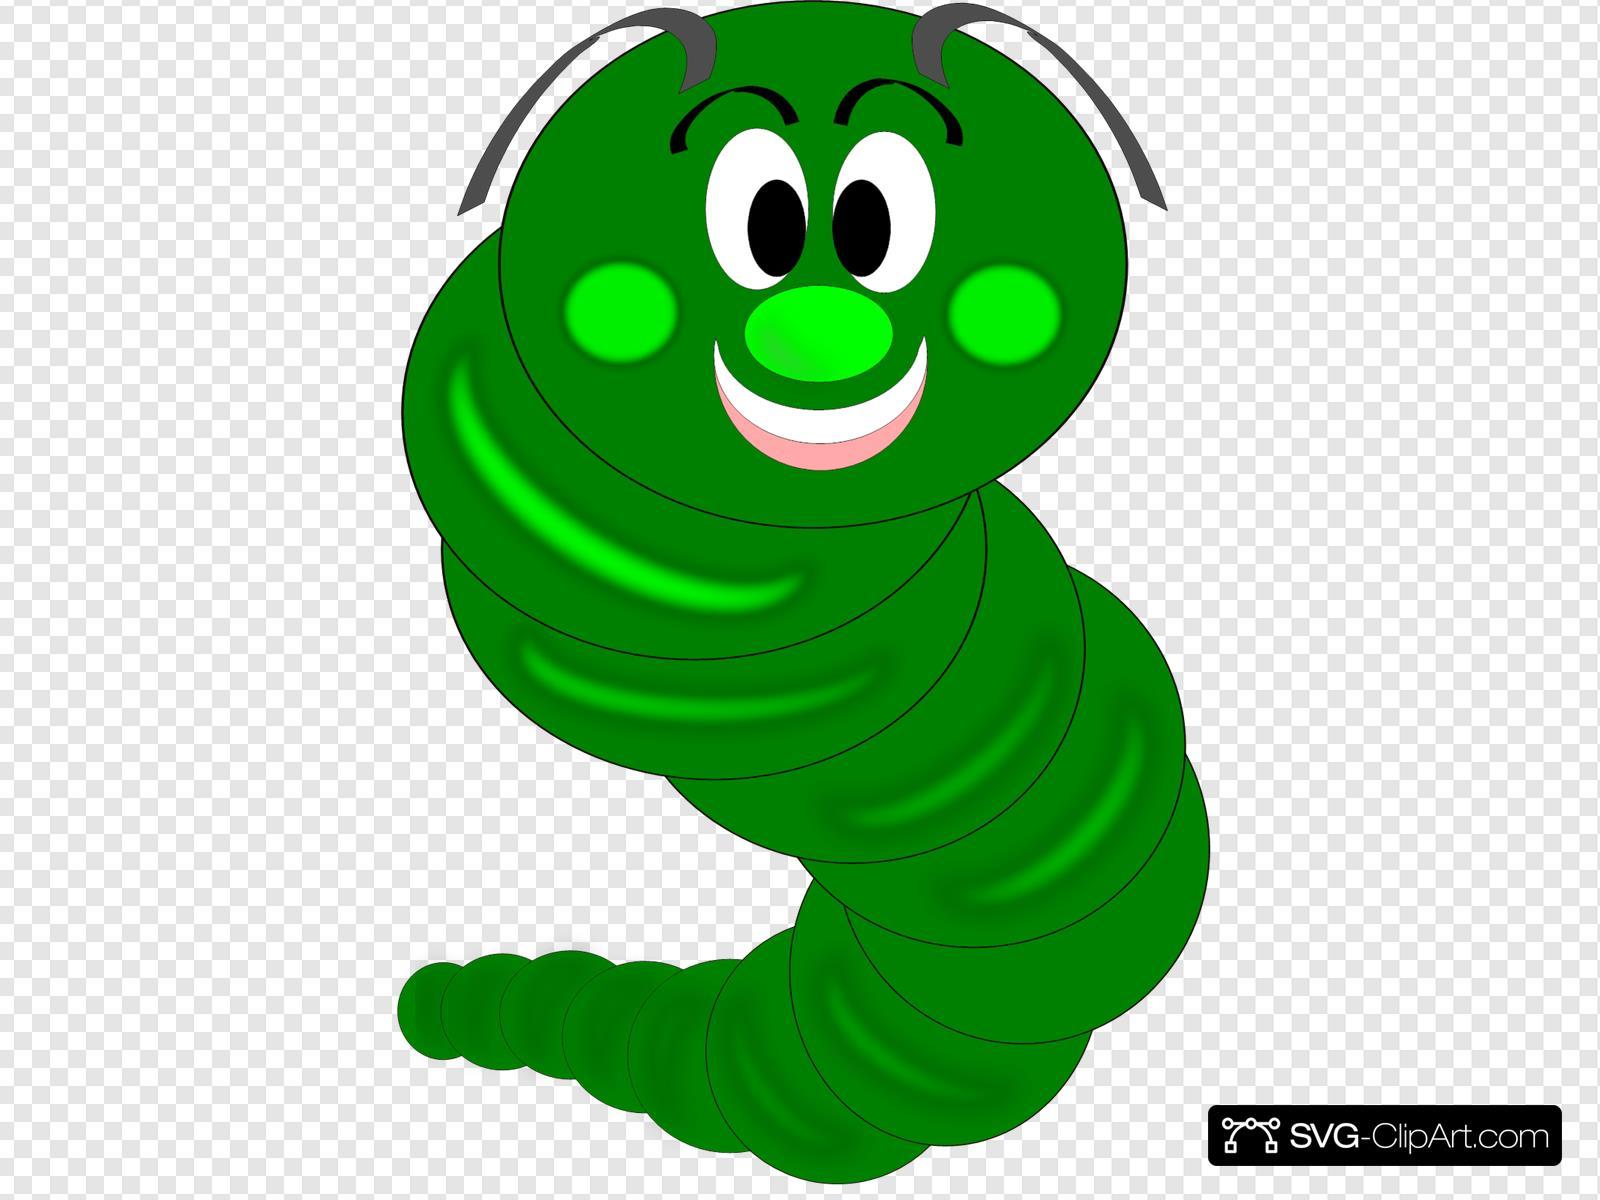 Cartoon Caterpillar Svg Vector Cartoon Caterpillar Clip Art Svg